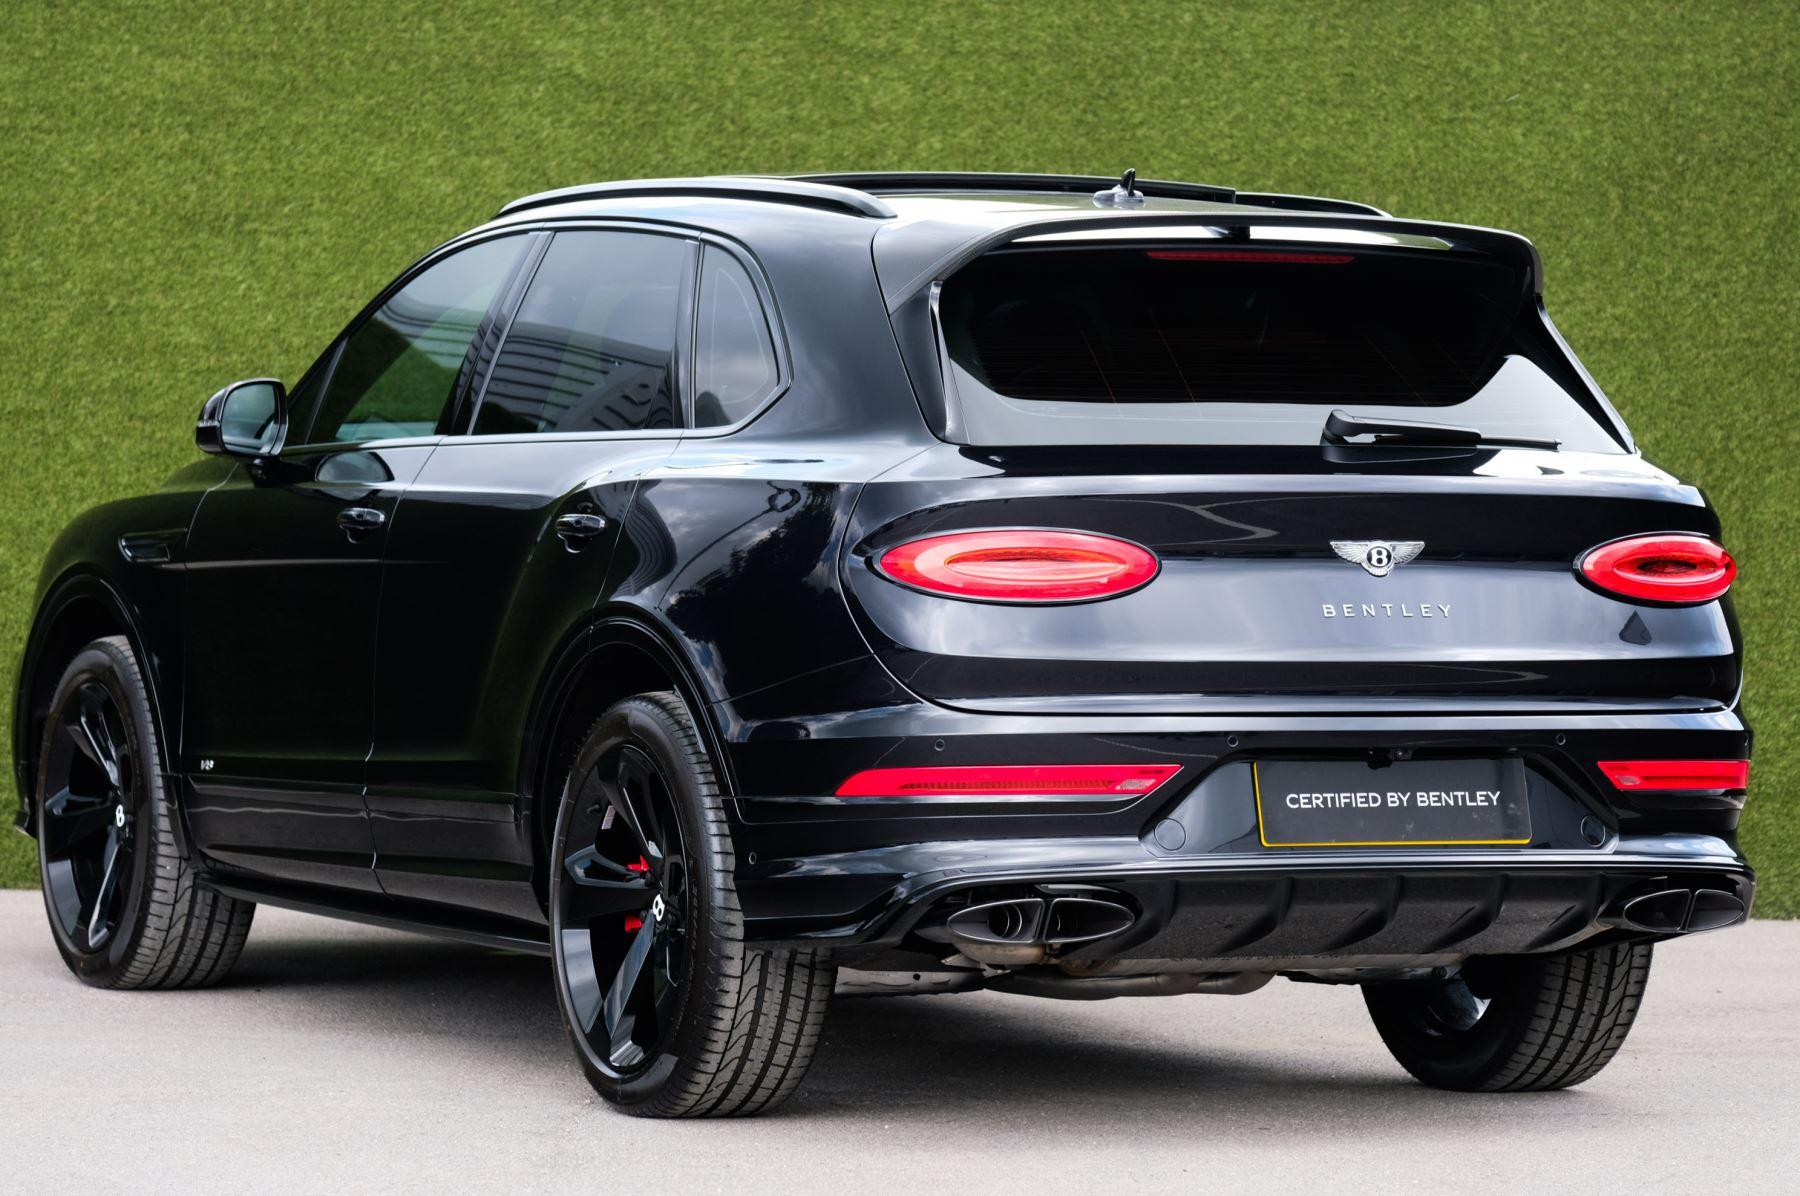 Bentley Bentayga 4.0 V8 - Mulliner Driving Specification for Black Specification image 5